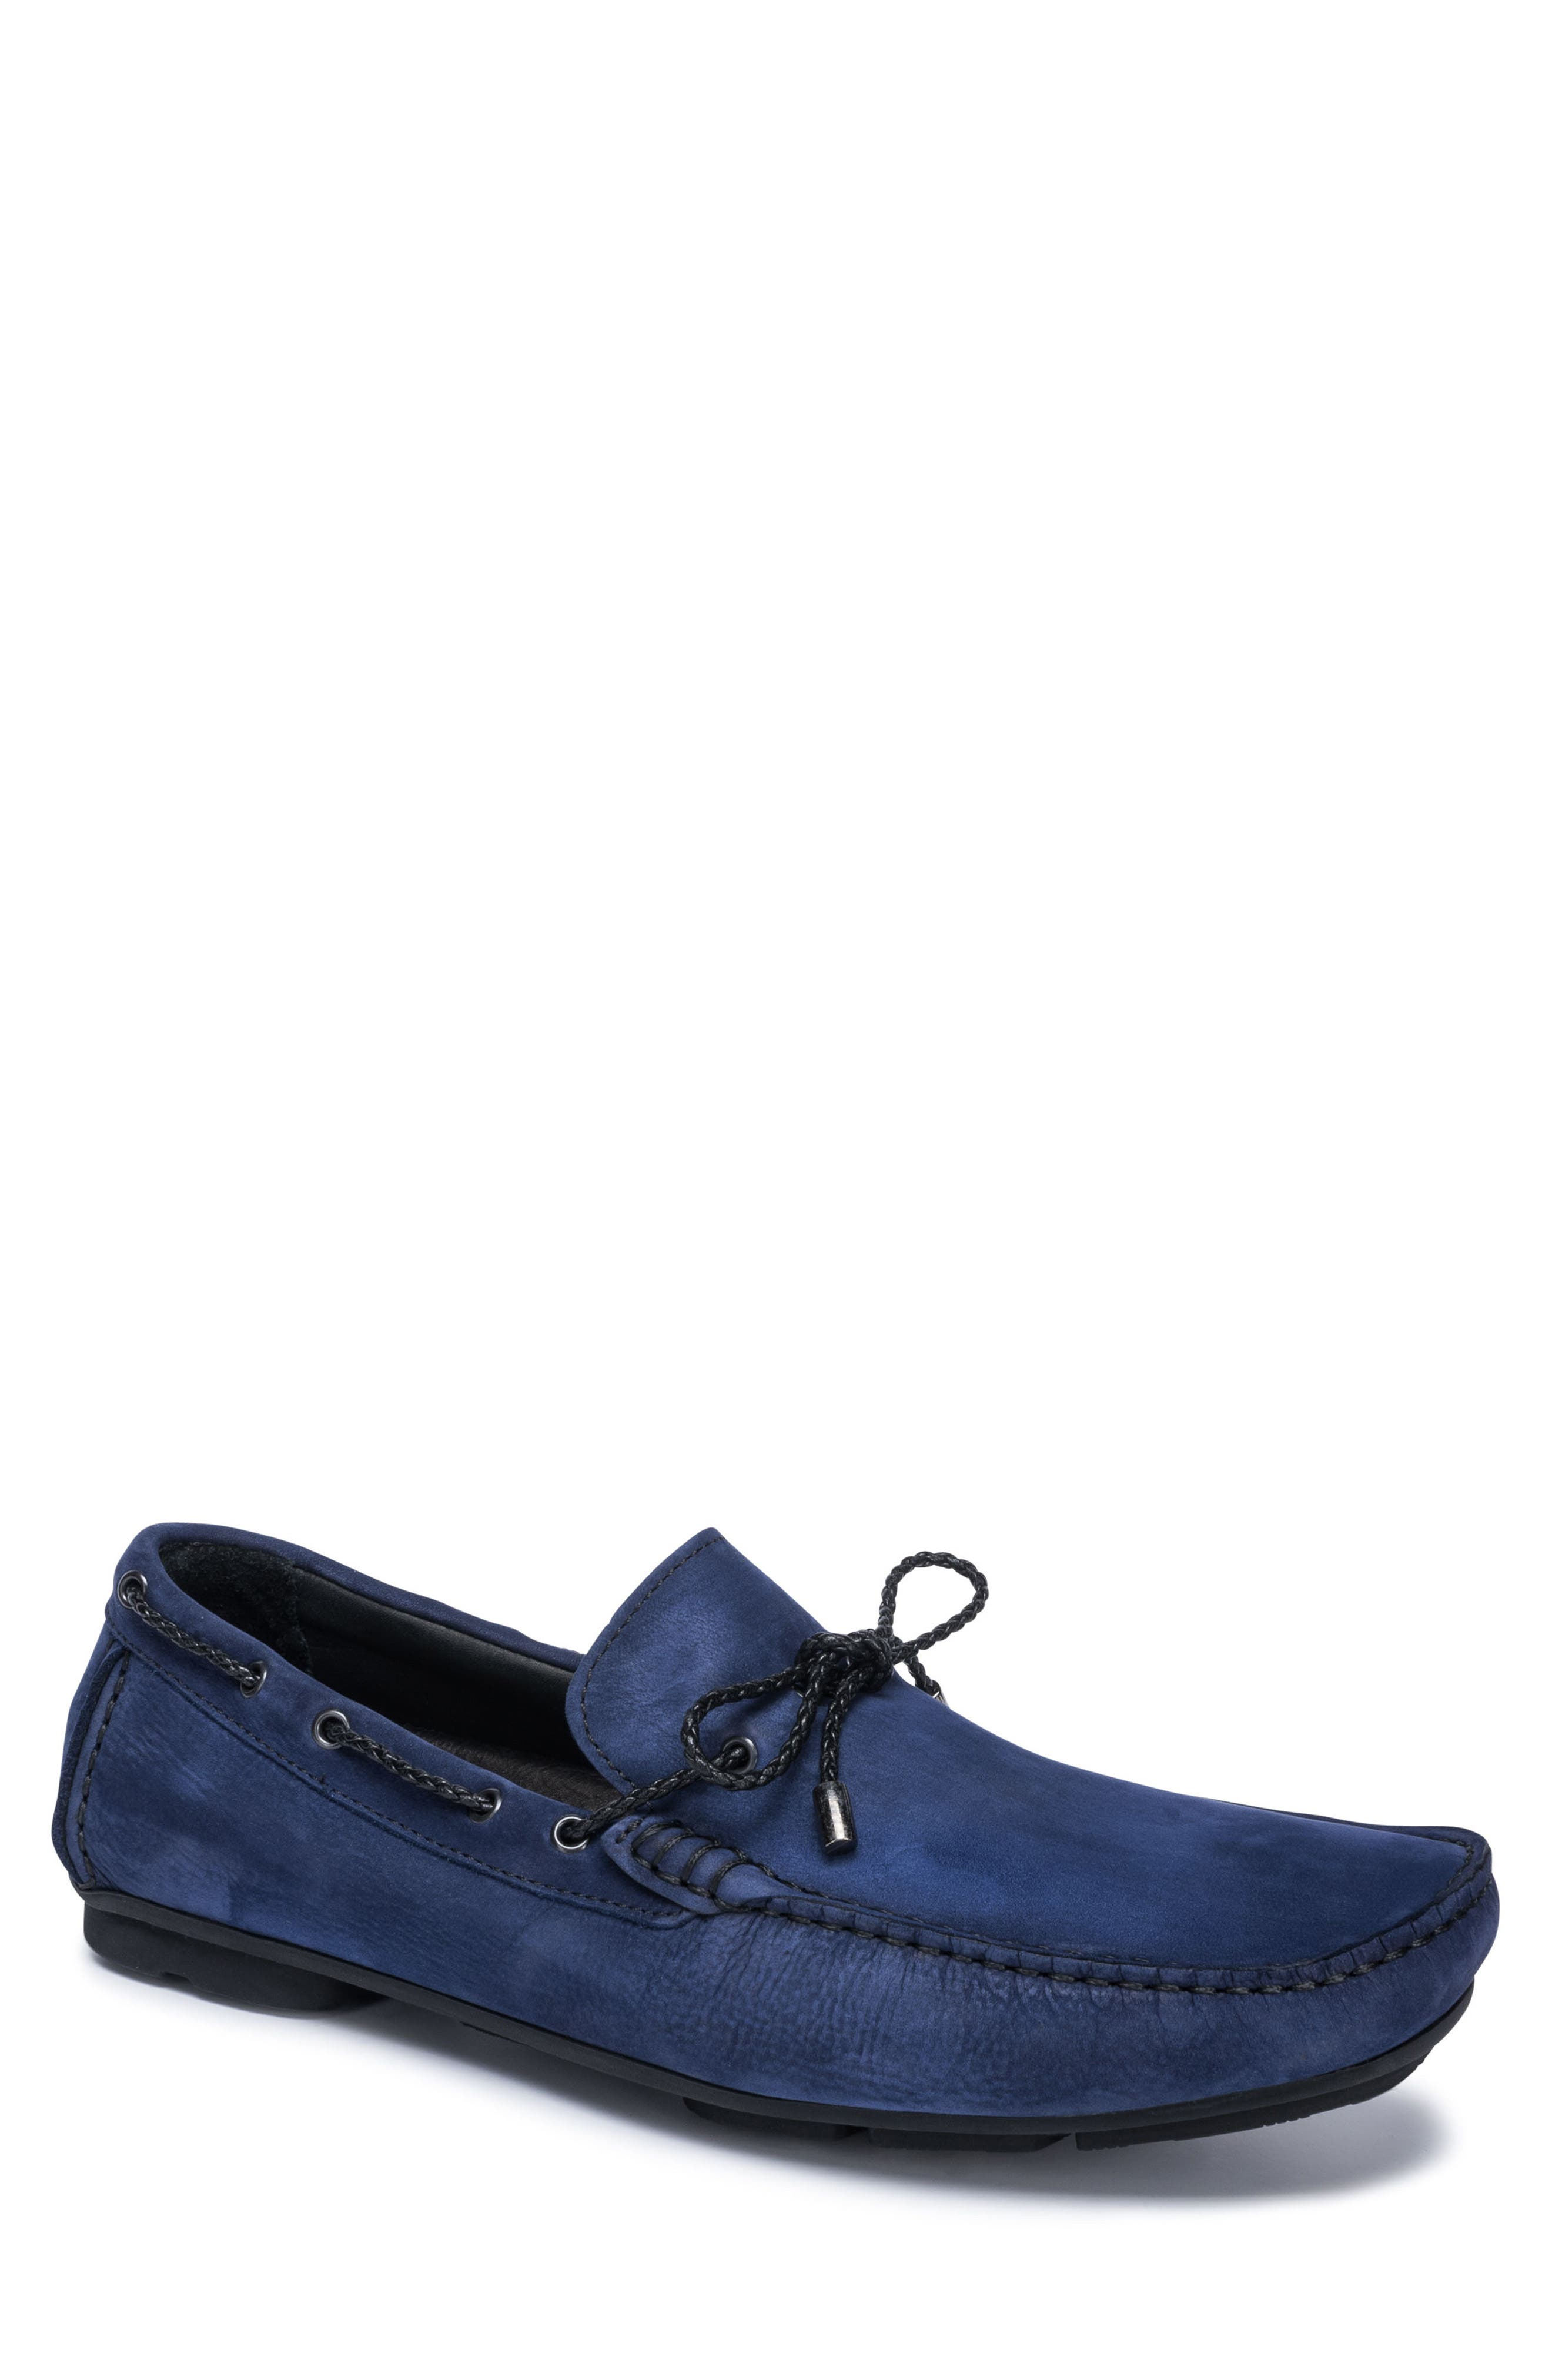 Alternate Image 1 Selected - Bugatchi Napoli Driving Shoe (Men)